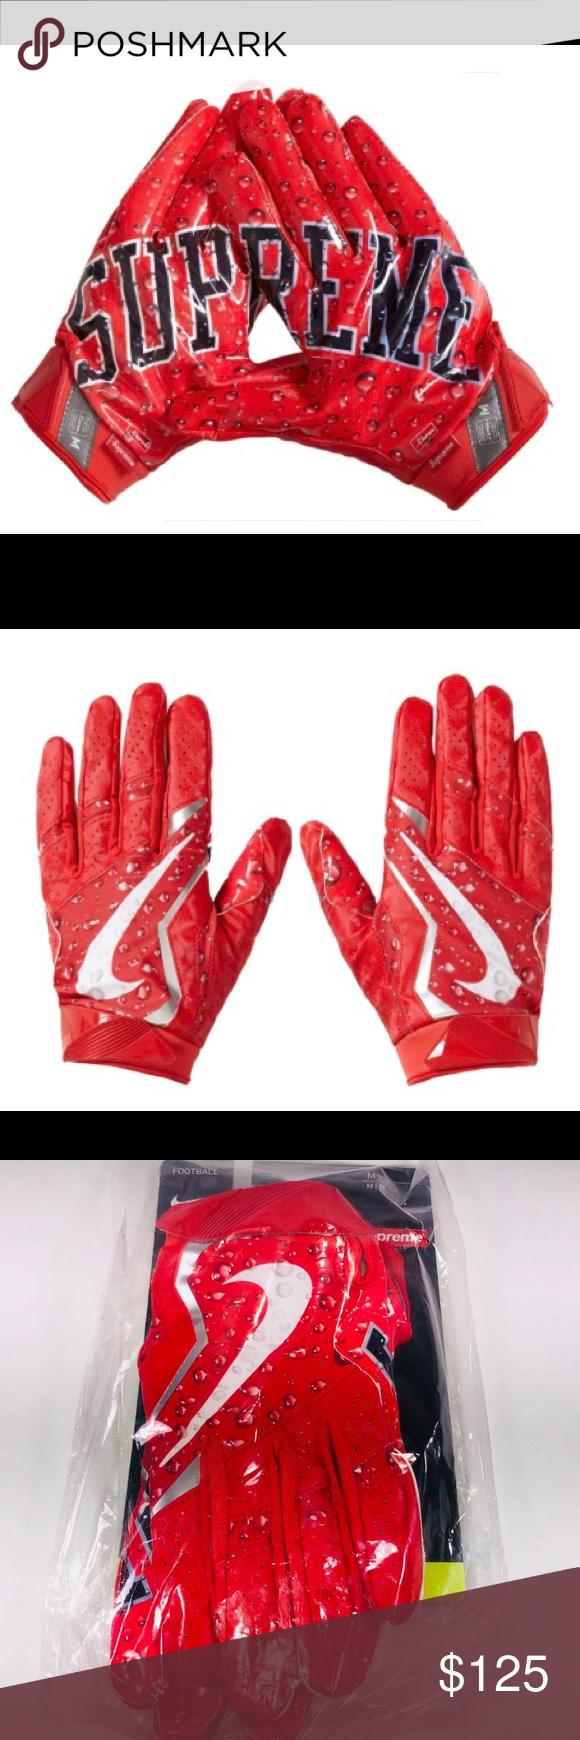 Supreme Nike Vapor Jet 4 0 Football Gloves Red Nike Vapor Black And Red Fashion Tips